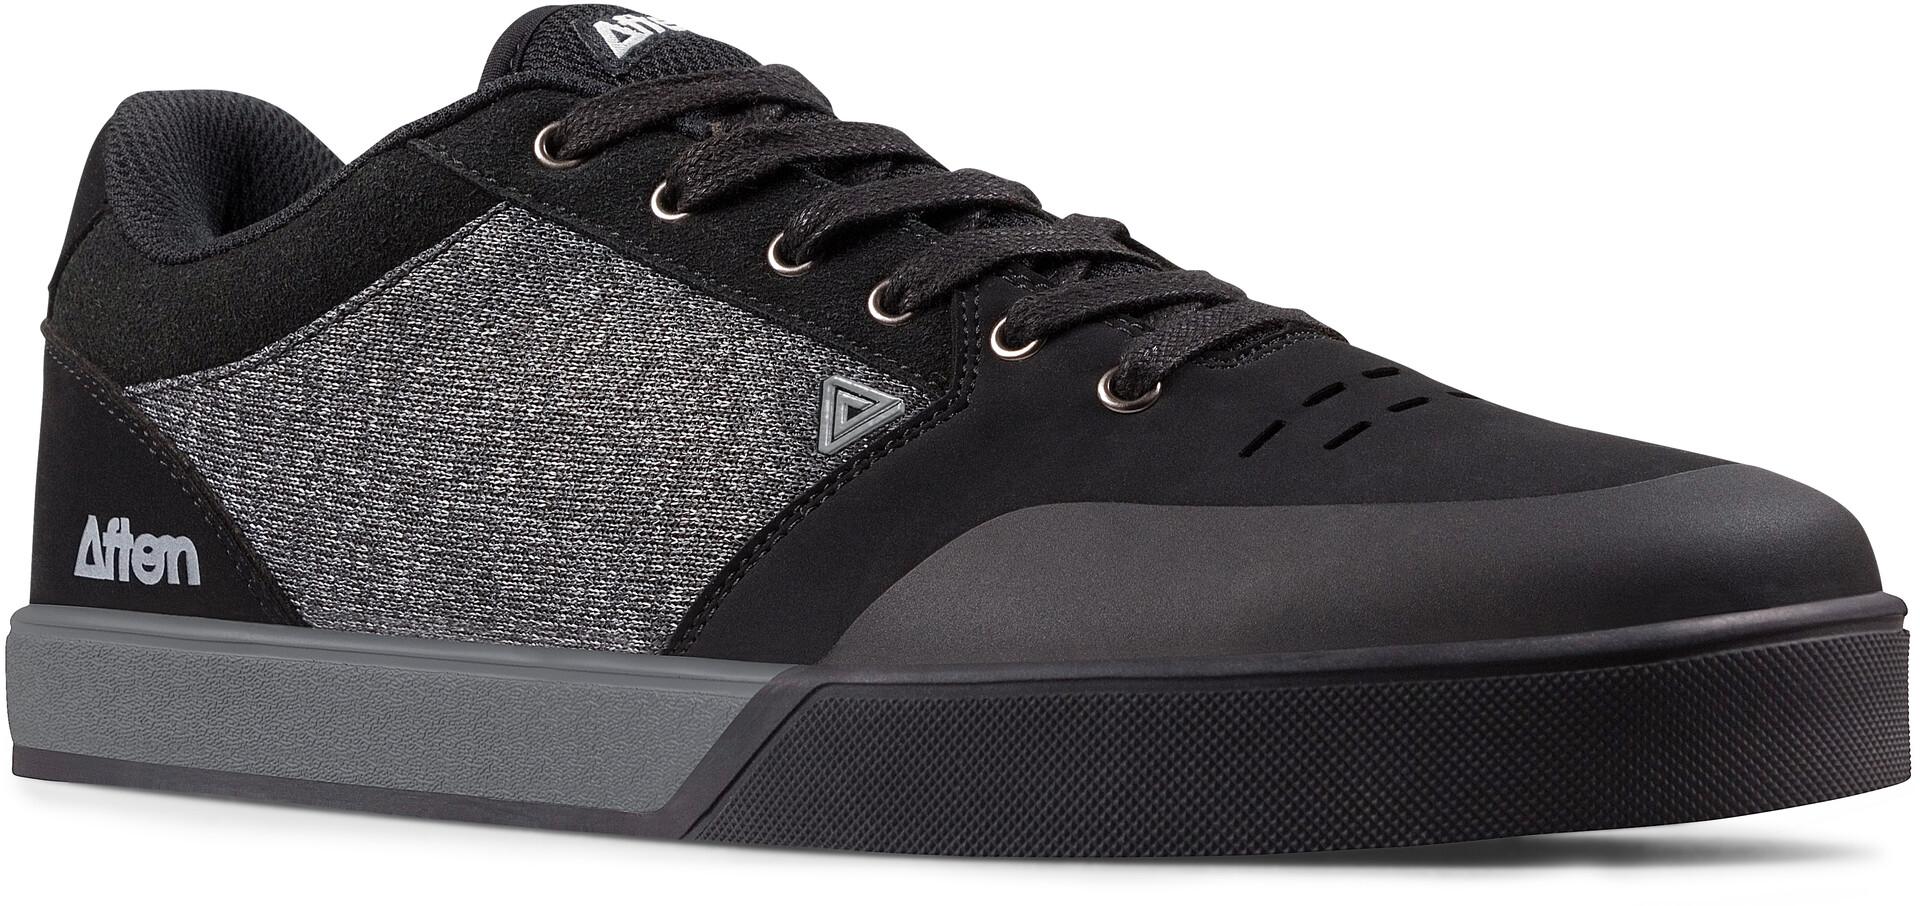 Afton Shoes Keegan Flatpedal Shoes Men blackheathered